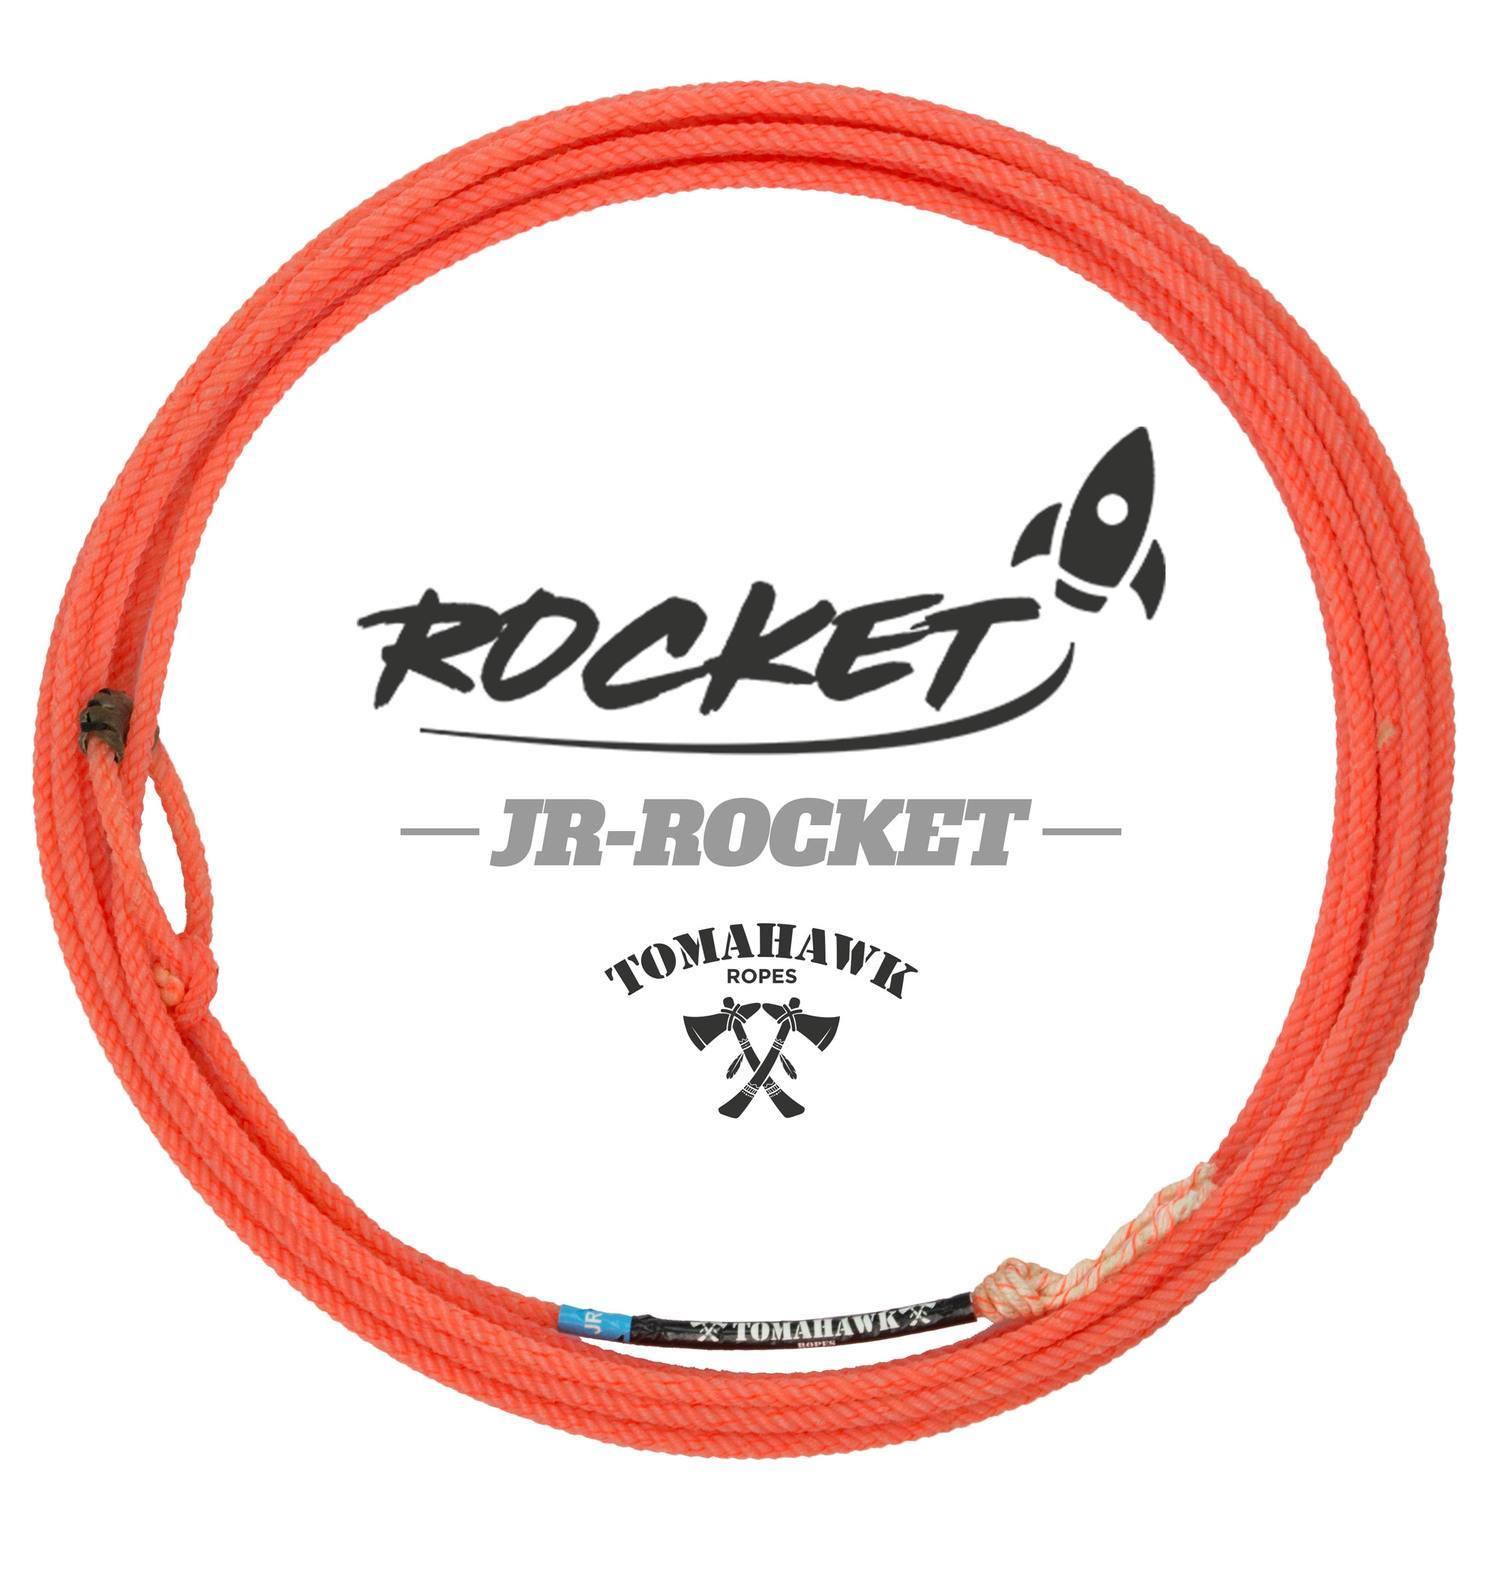 Corda Infantil Tomahawk Junior Rocket